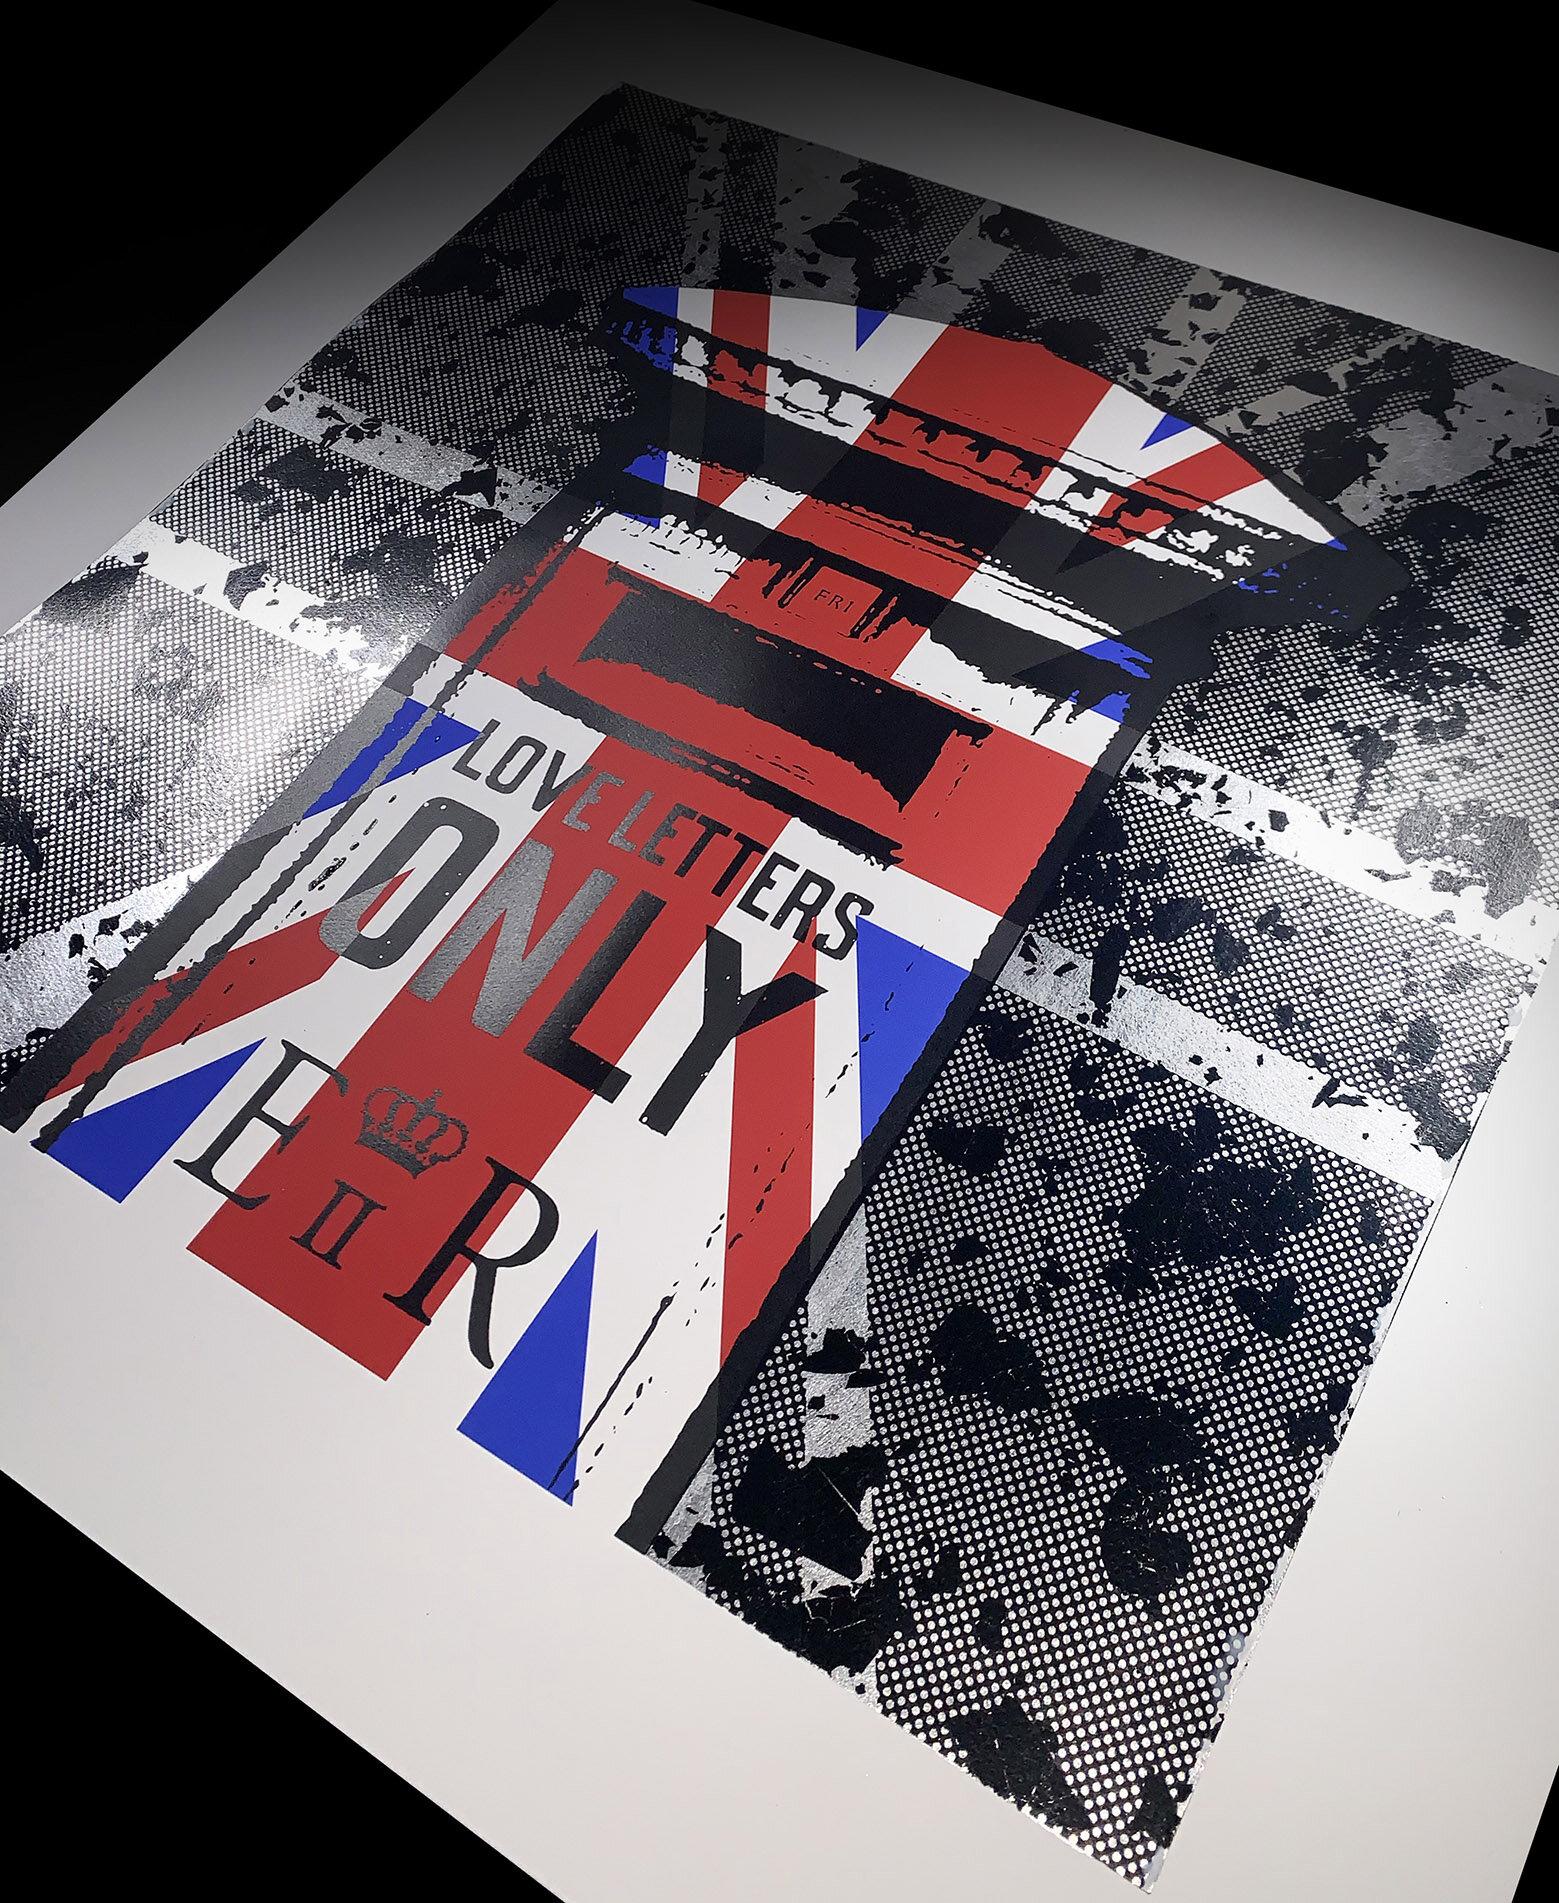 MArk+Petty+Brit+pop+02